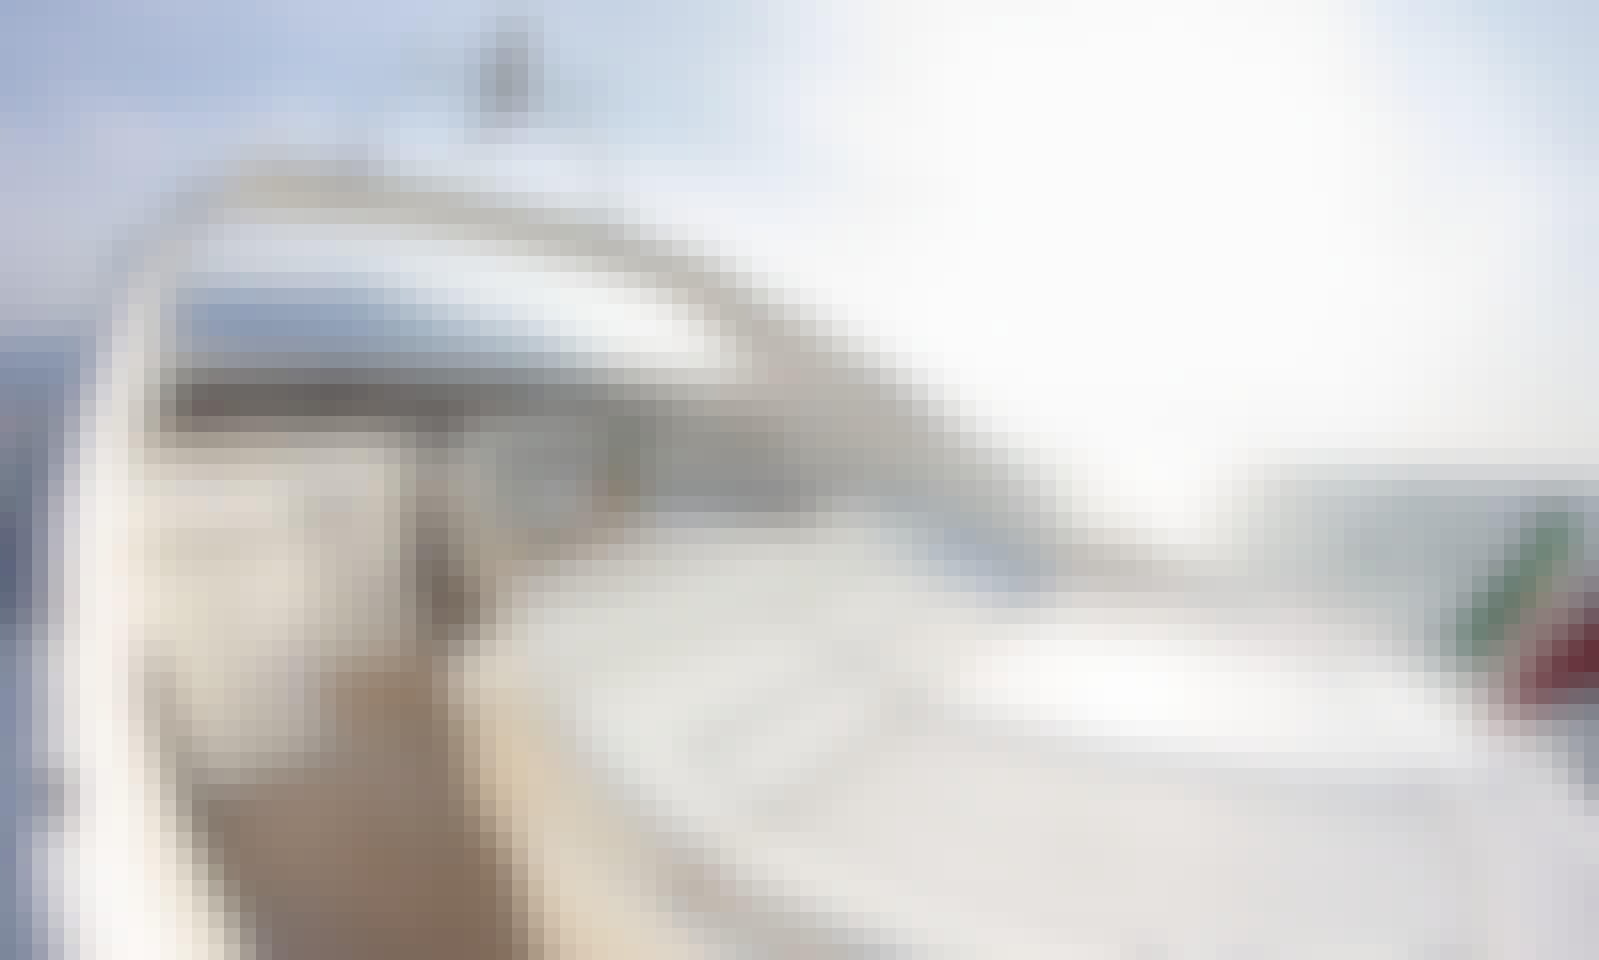 """Yacht"" PRINCESS V50"" rental in Sorrento, Capri and Amalfi Coast"